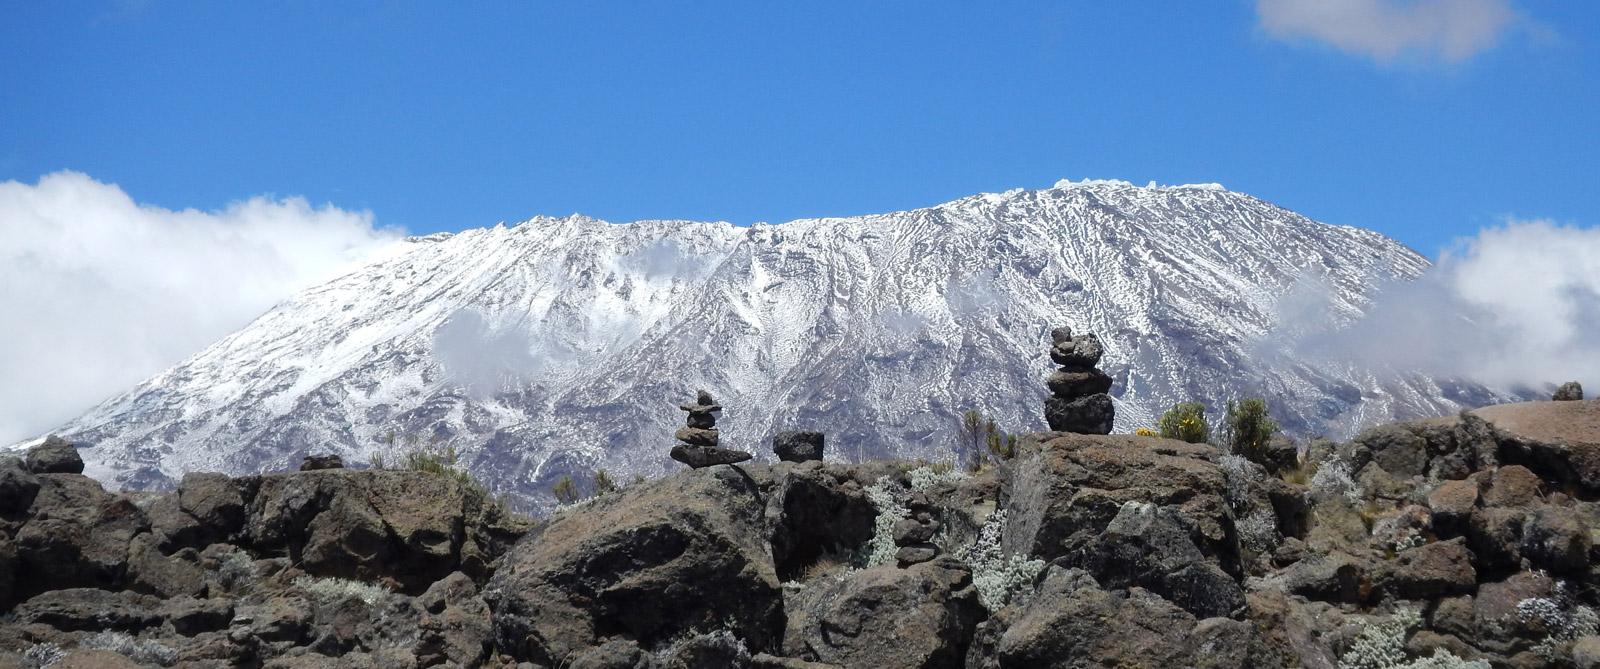 Rock cairns dwarfed by Mount Kilimanjaro in the distance © Shelley Hyne